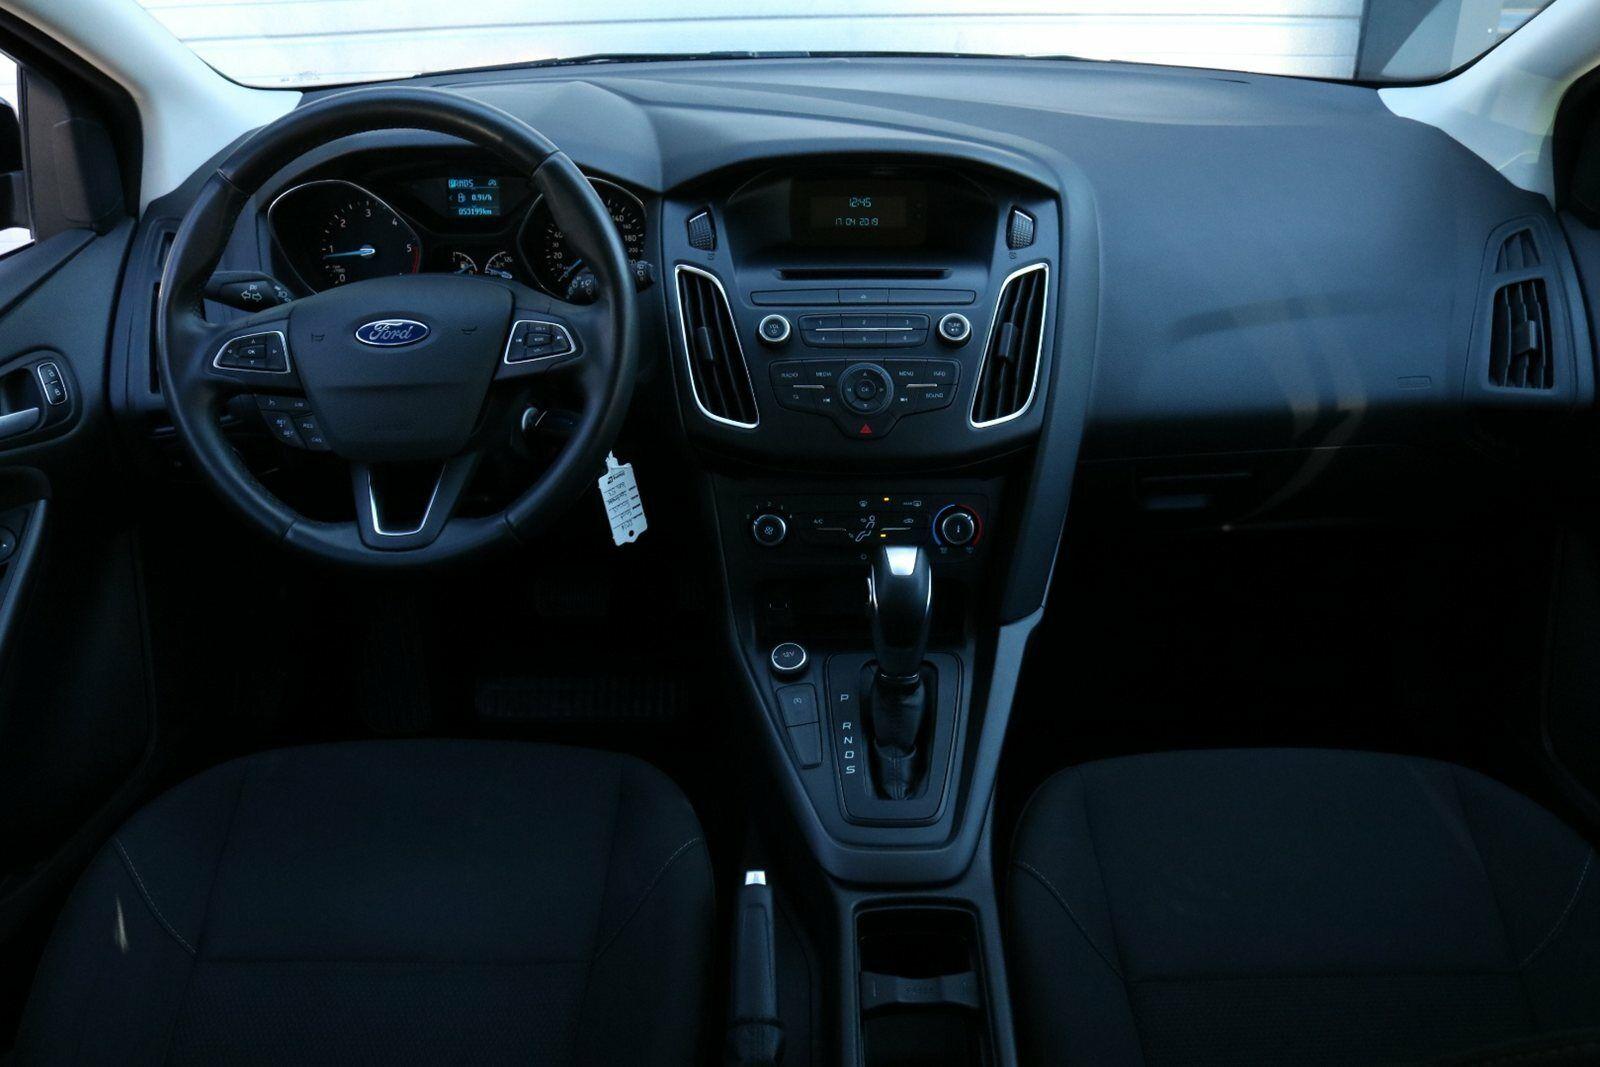 Ford Focus TDCi 120 Trend stc. aut.